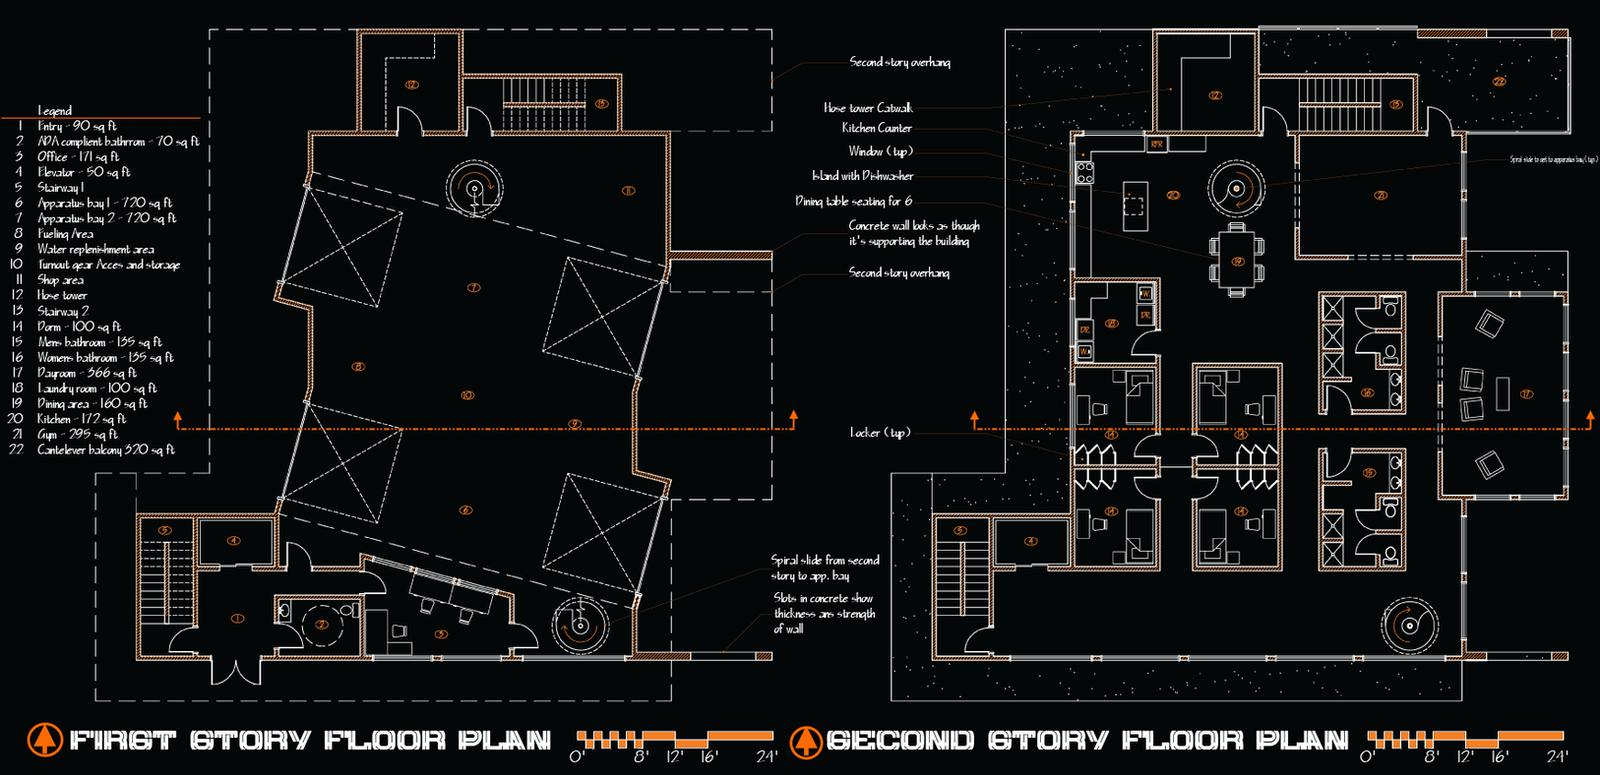 Fire Station Floor Plan By Codeblu90 On Deviantart